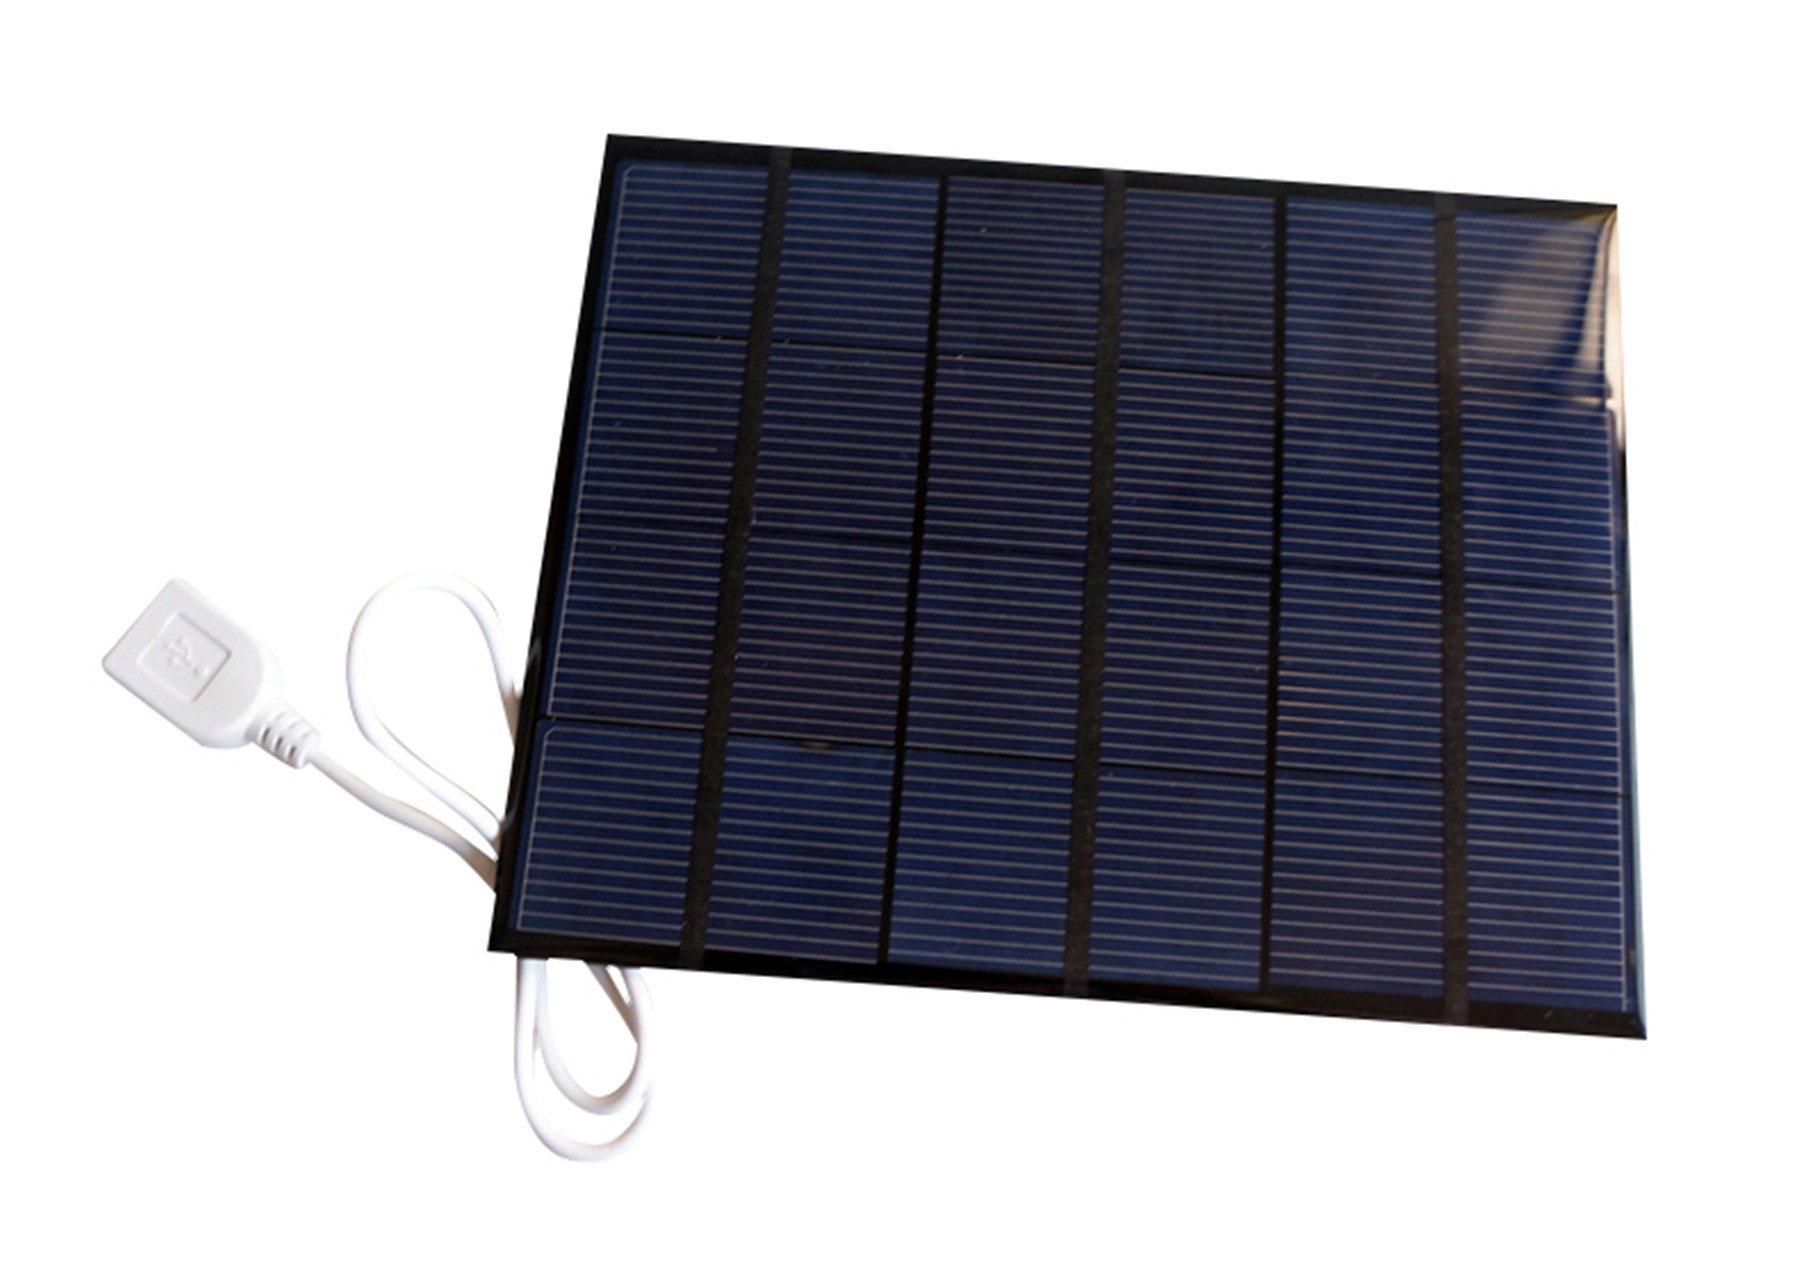 Sunnytech 3.5w 6v USB Mini Solar Panel Module DIY Polysilicon Solar Epoxy Cell Charger B034